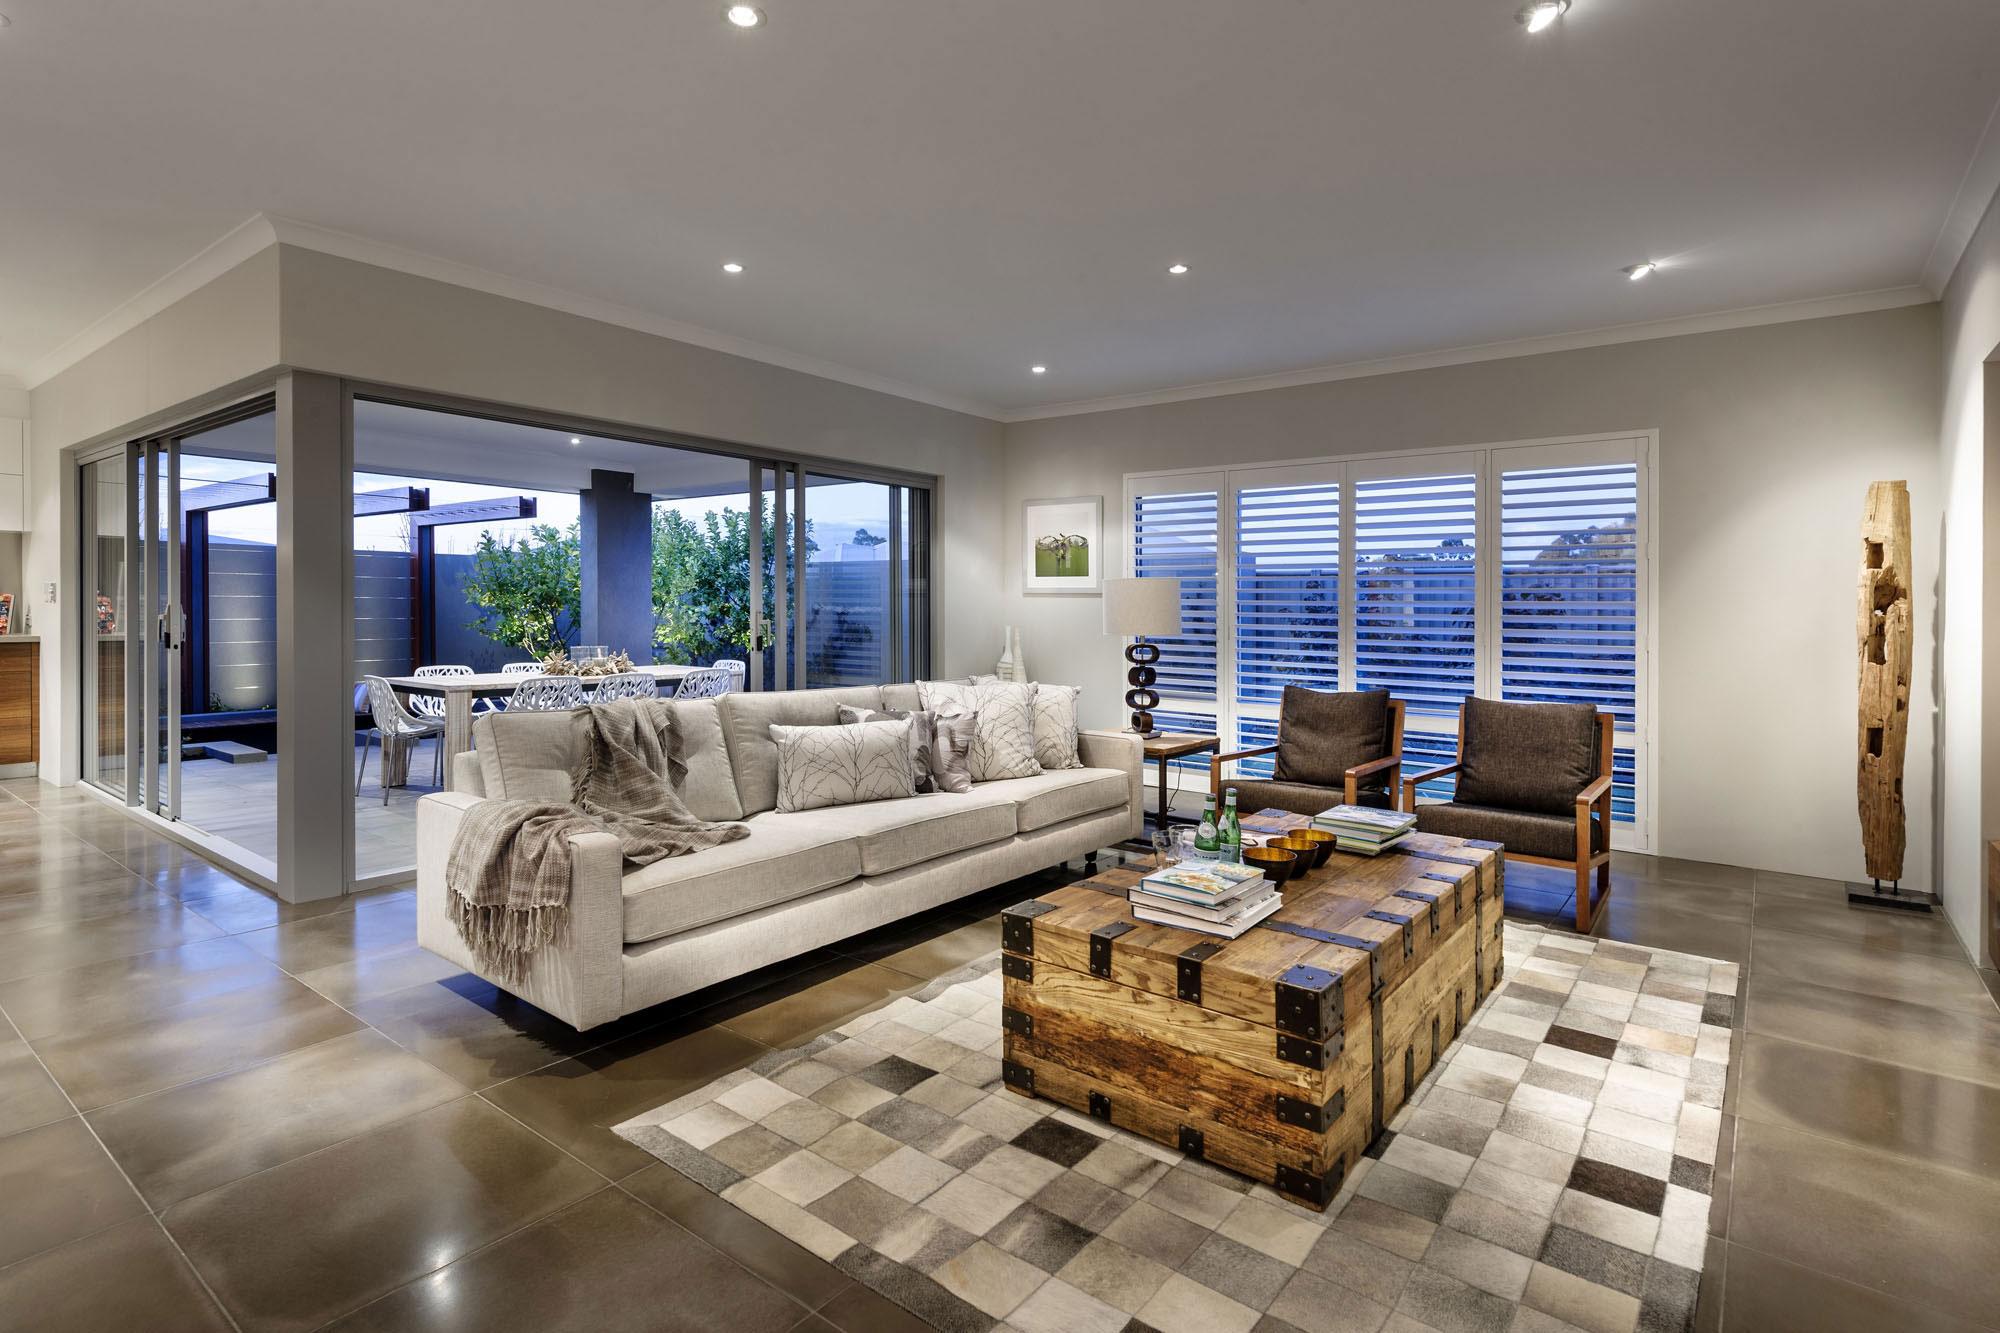 Rustic Wood Coffee Table, Sofa, Living Room, Modern Home in Wandi, Perth